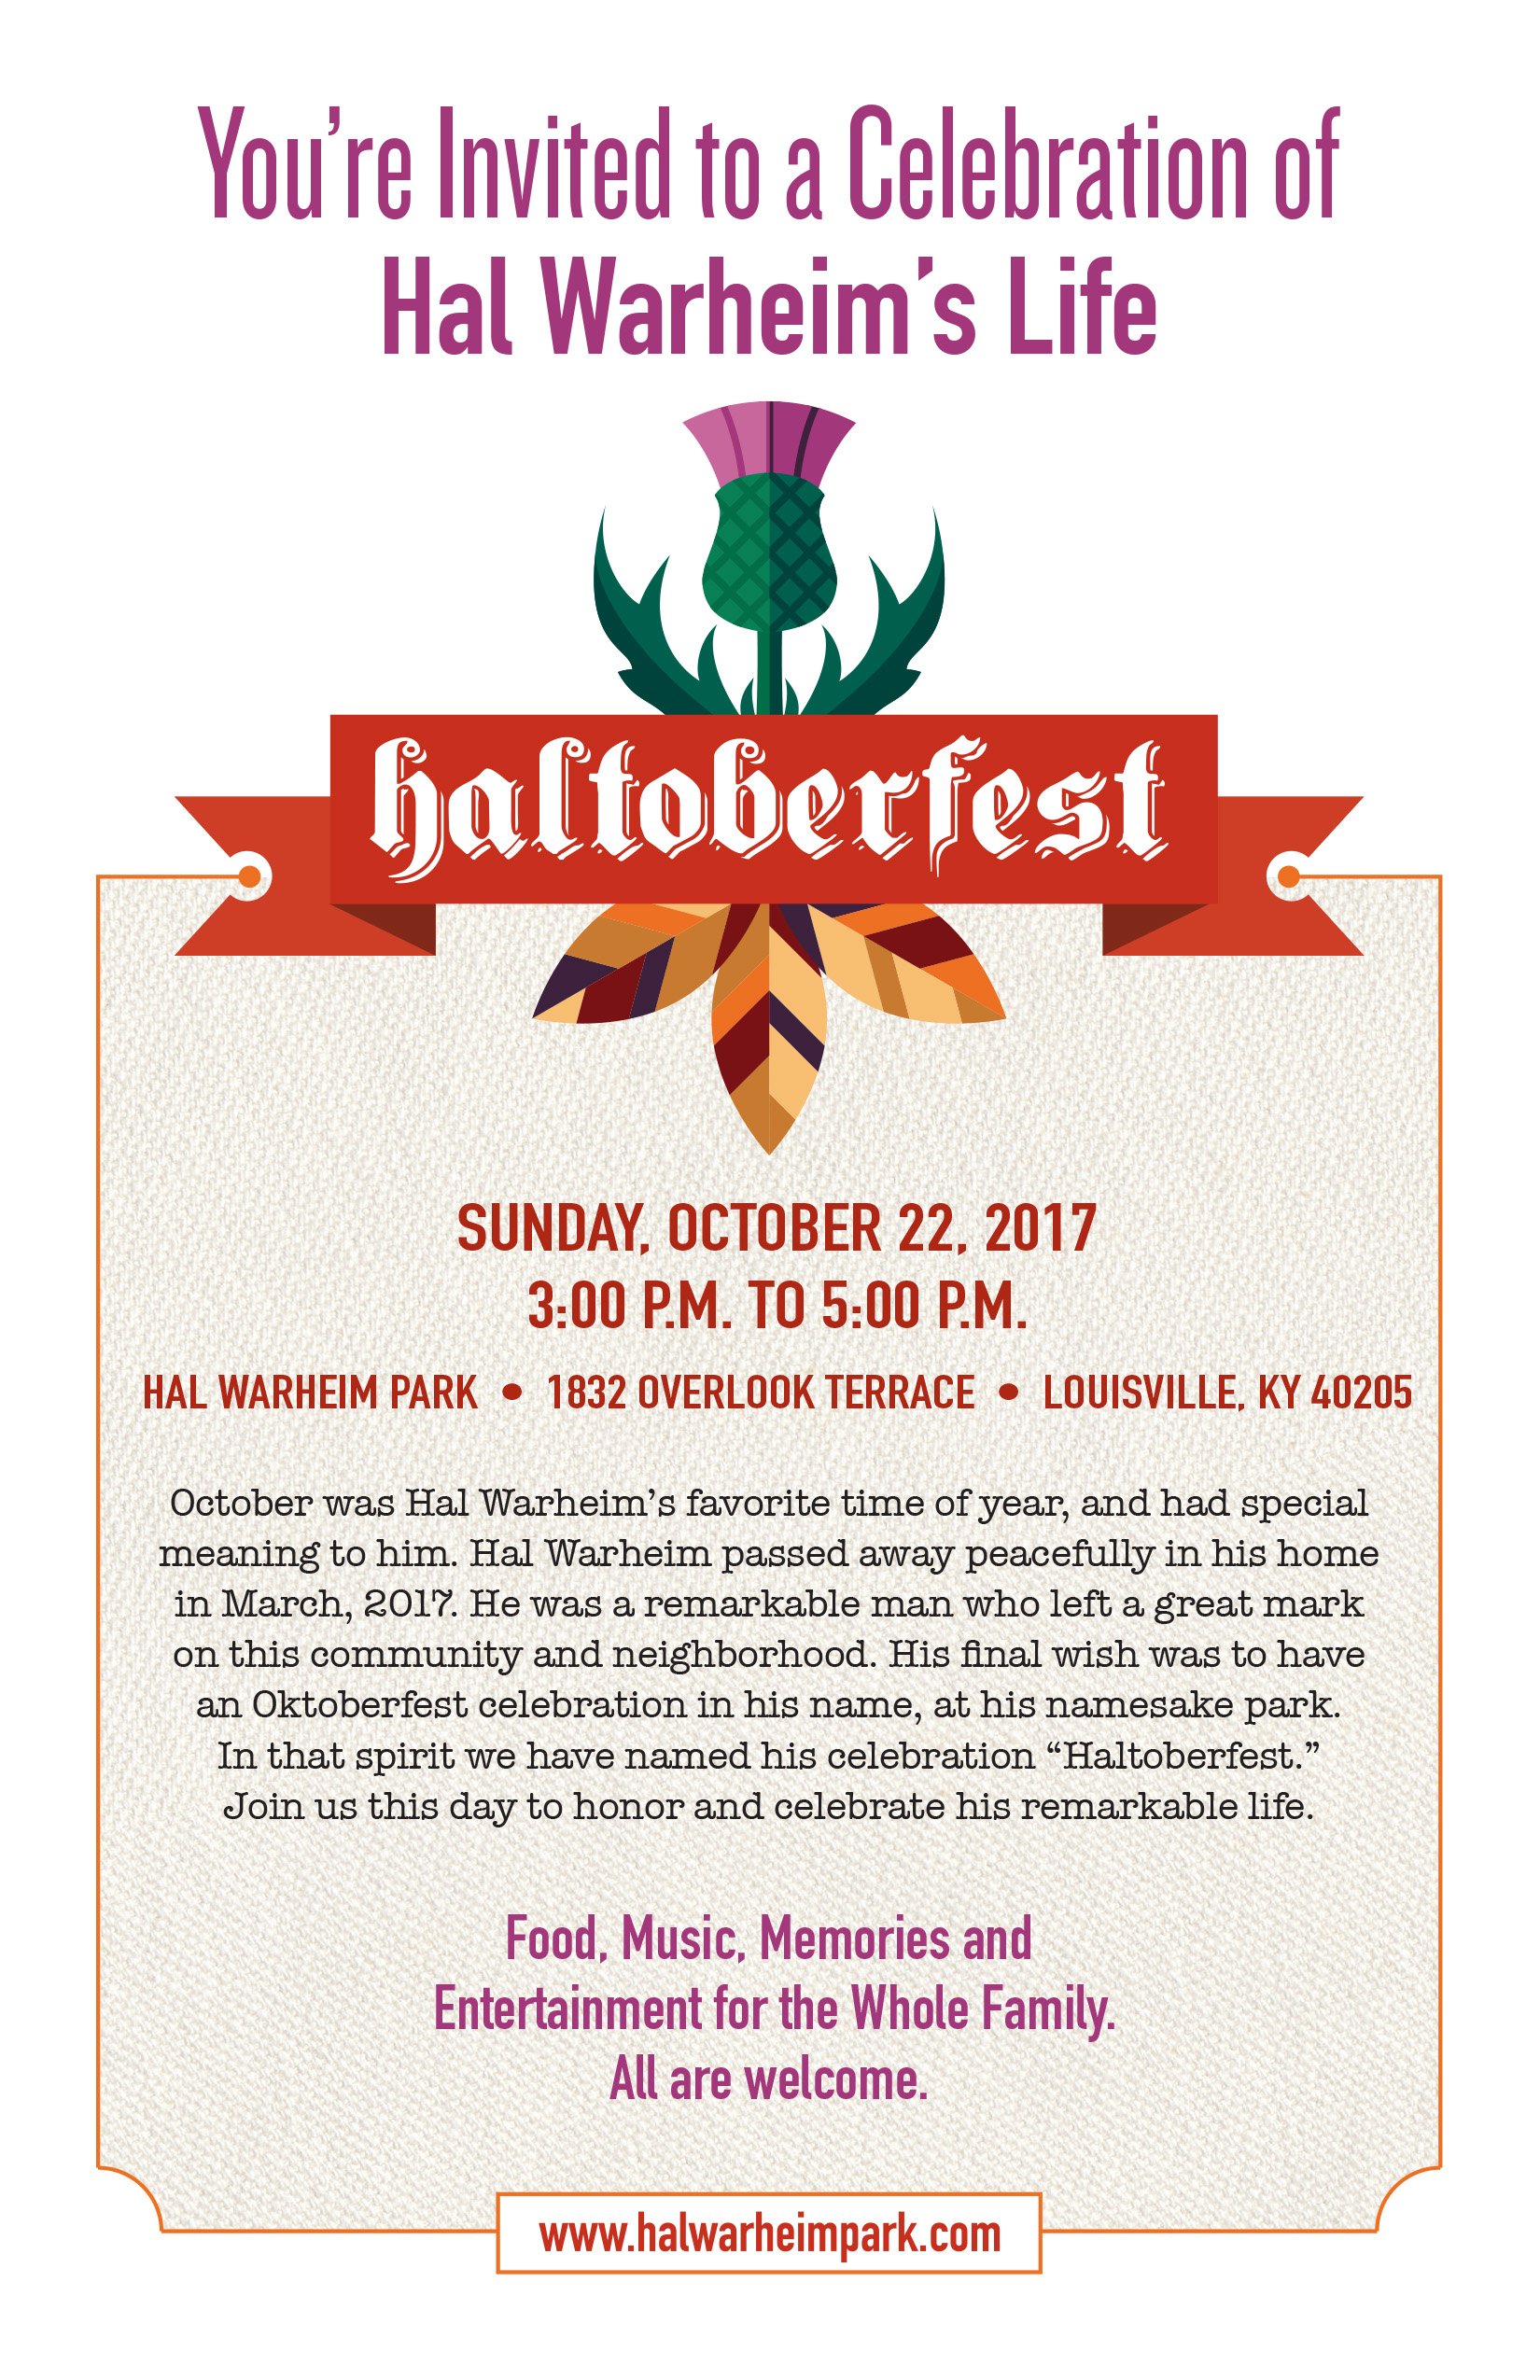 haltoberfest-invitation-10-4-17.jpg